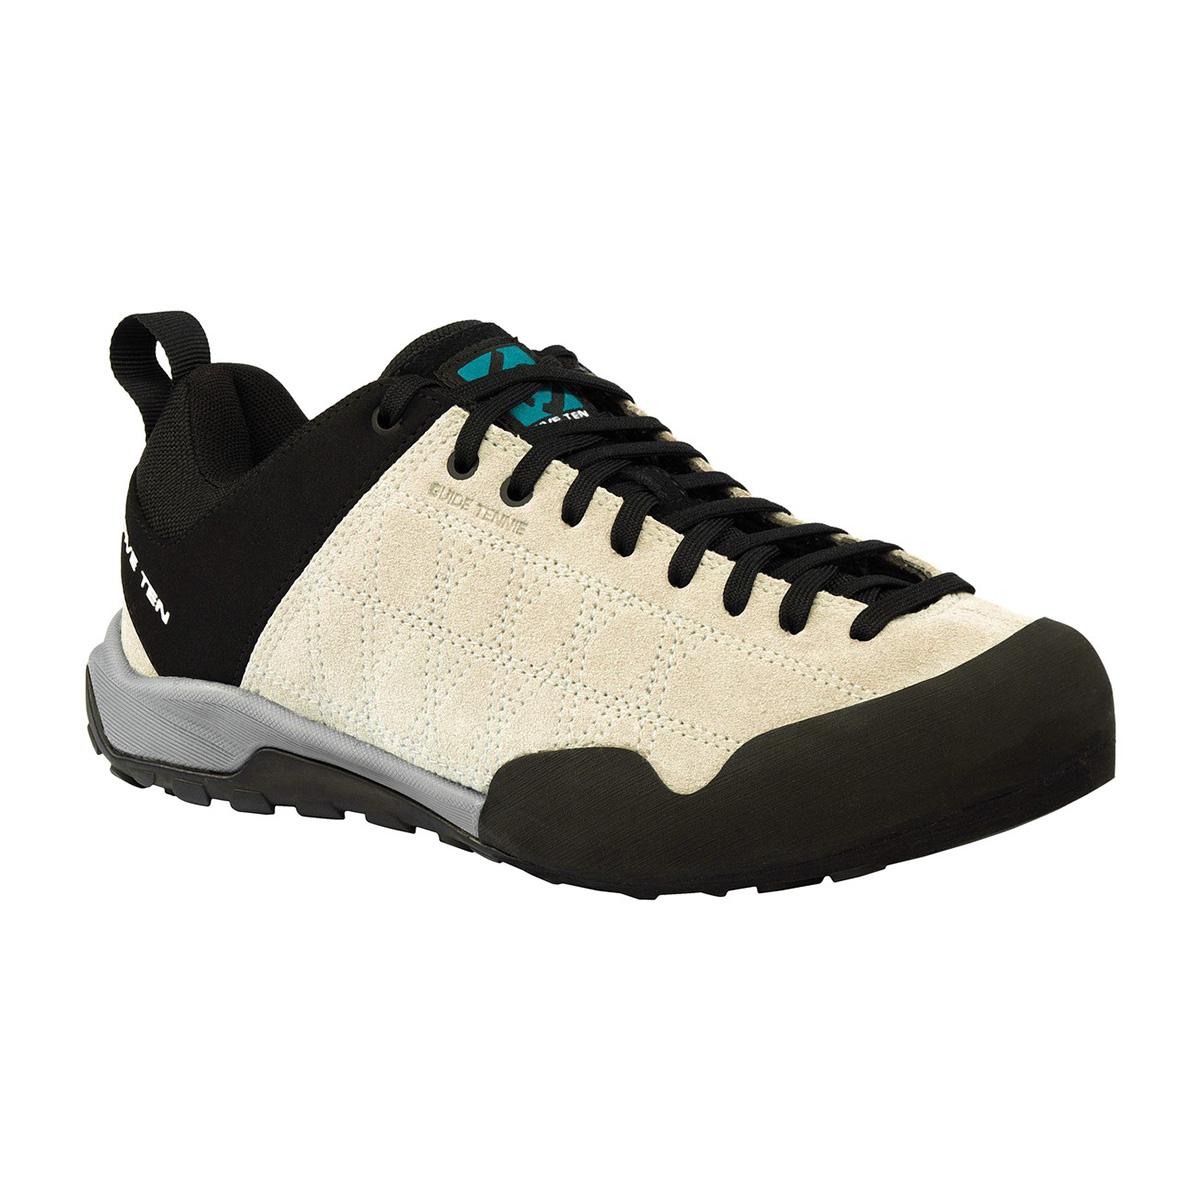 3fe57e2d224 Womens approach shoe Five Ten Guide Tennie ...